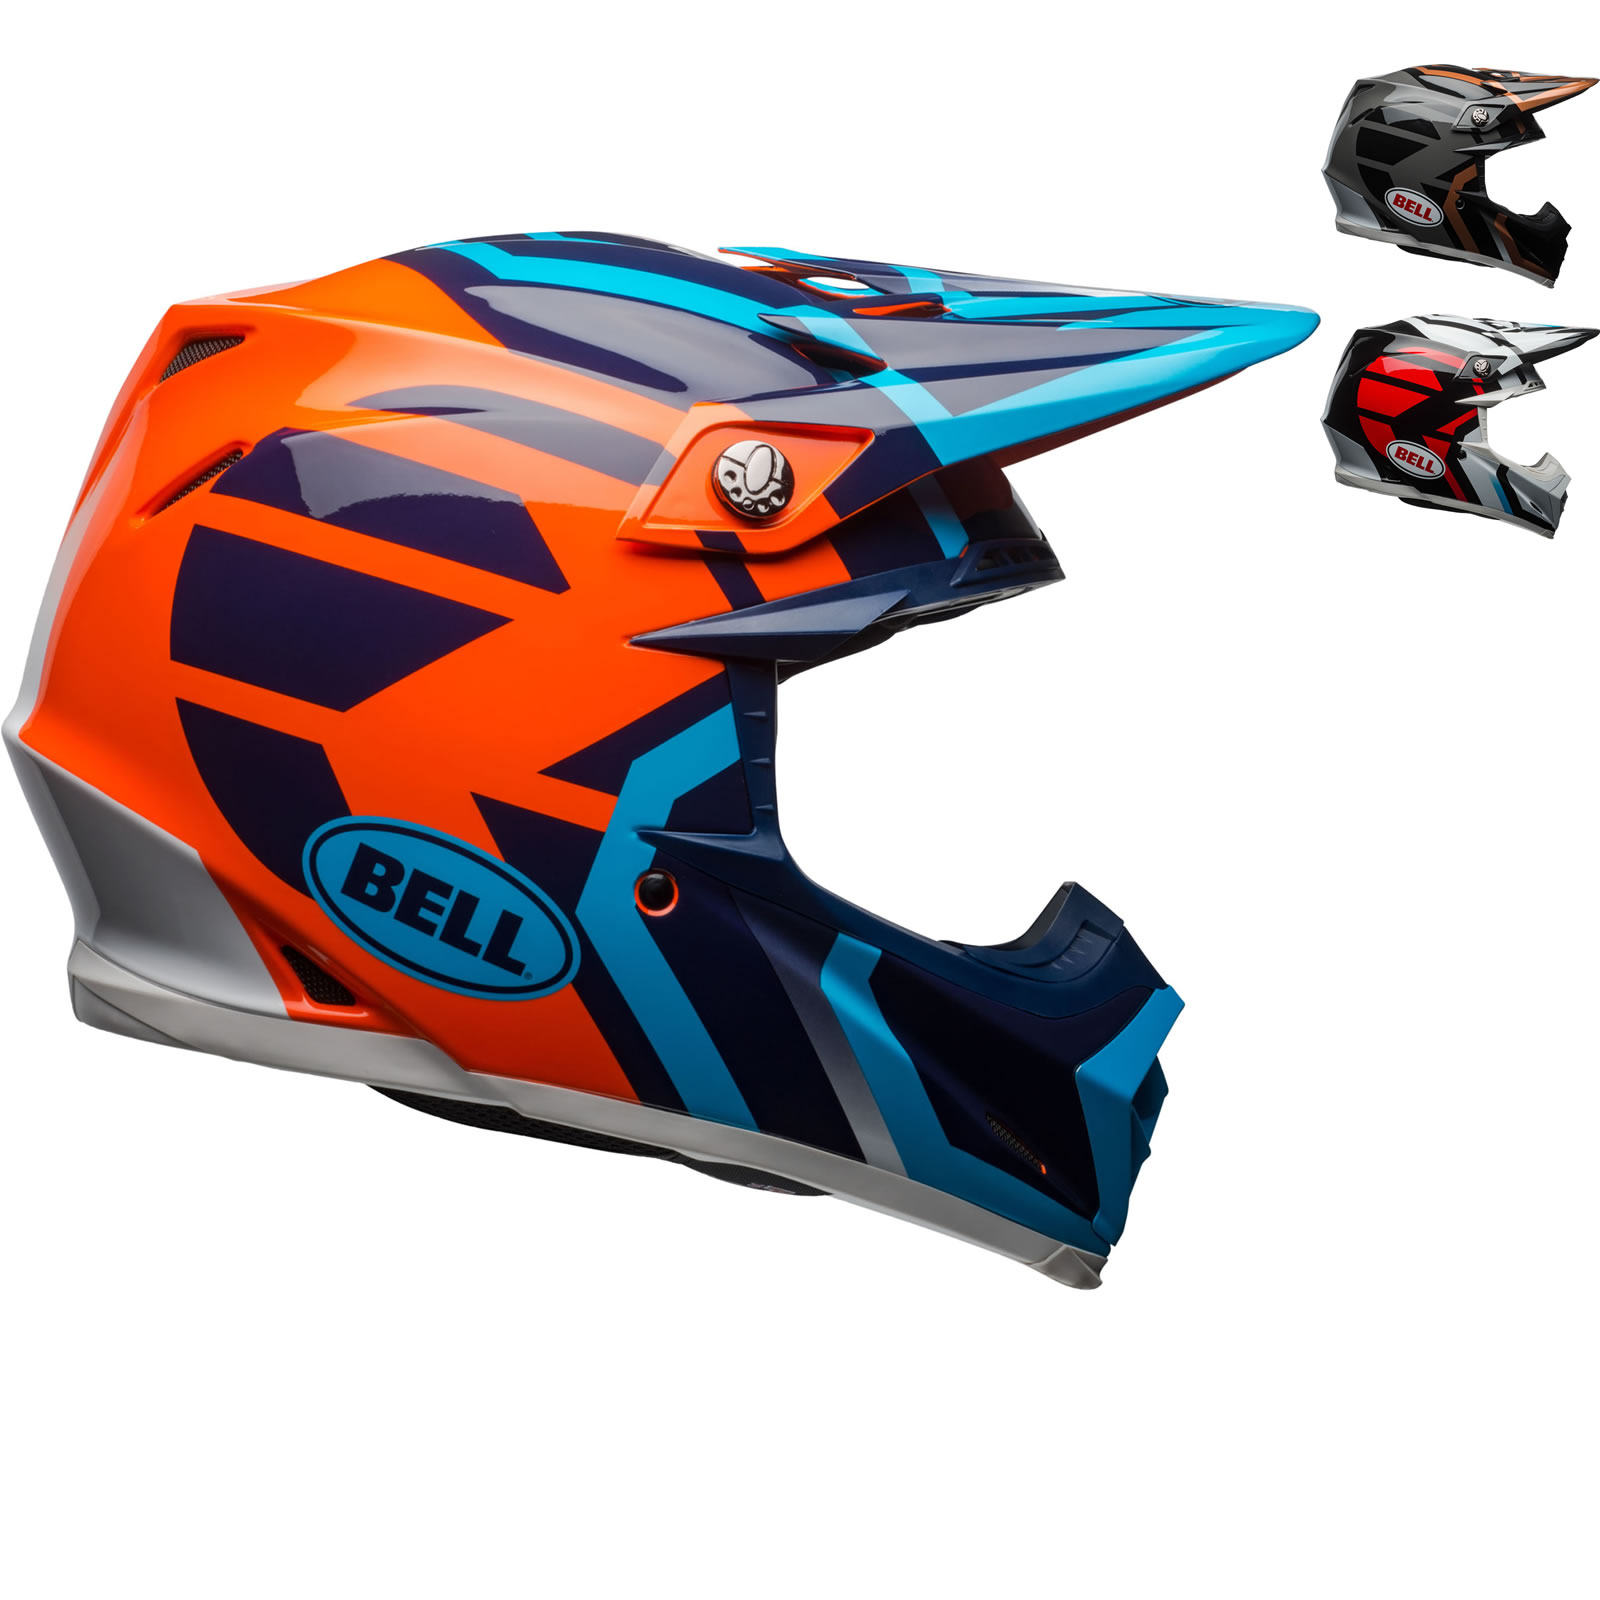 bell moto 9 mips district motocross helmet new arrivals. Black Bedroom Furniture Sets. Home Design Ideas